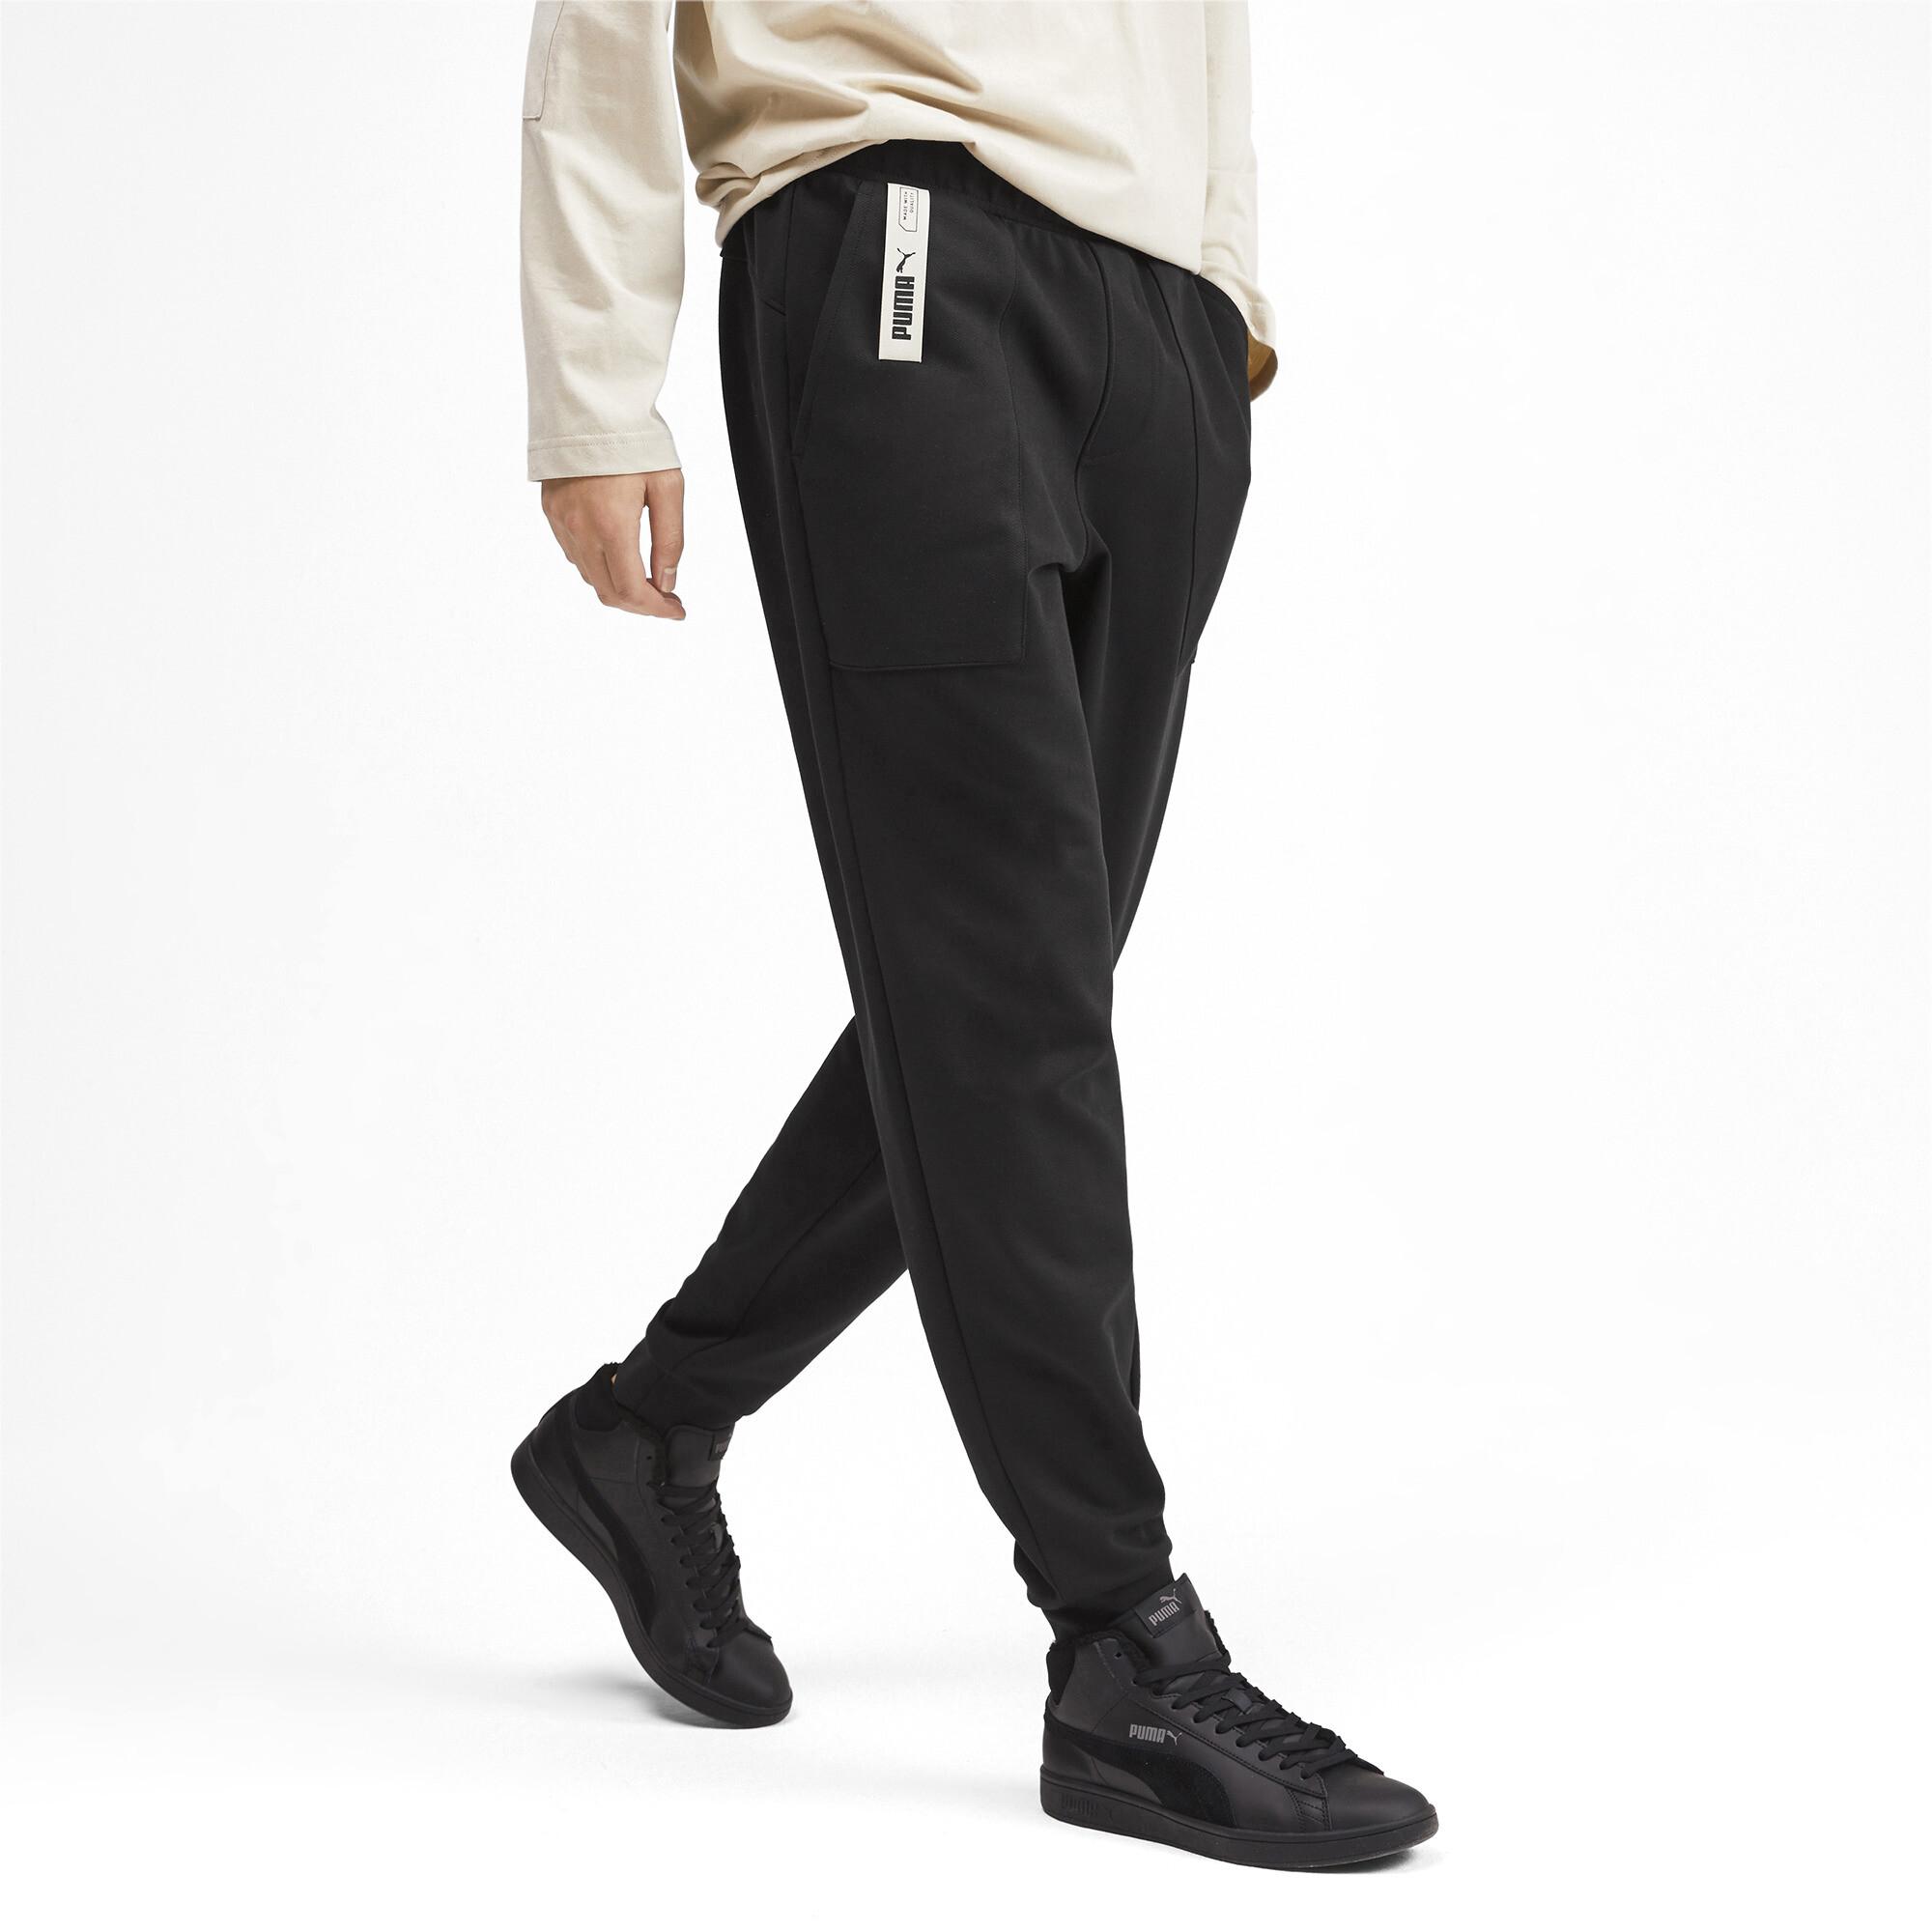 PUMA-NU-TILITY-Men-039-s-Sweatpants-Men-Knitted-Pants-Basics thumbnail 14